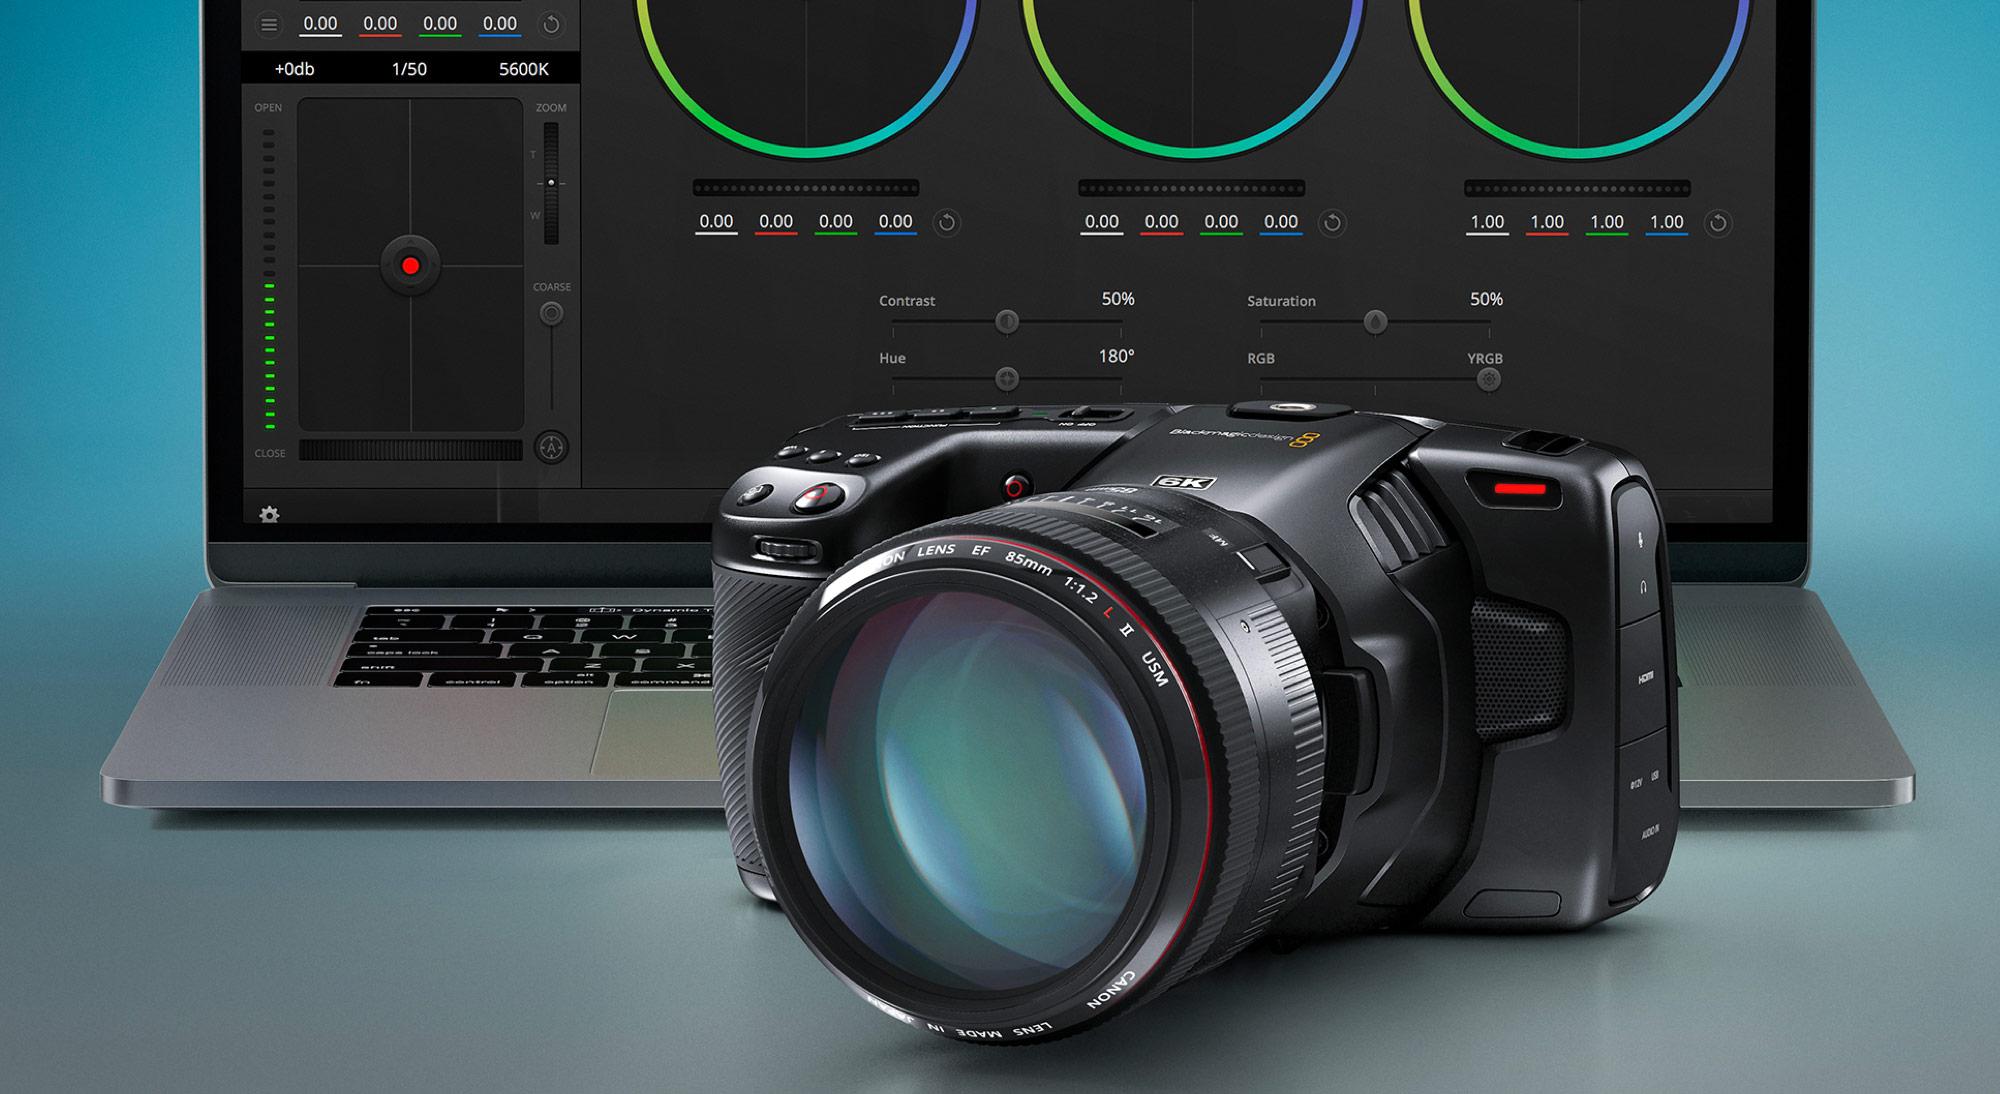 Blackmagic Design Announces New Low Price for Pocket Cinema Camera 6K